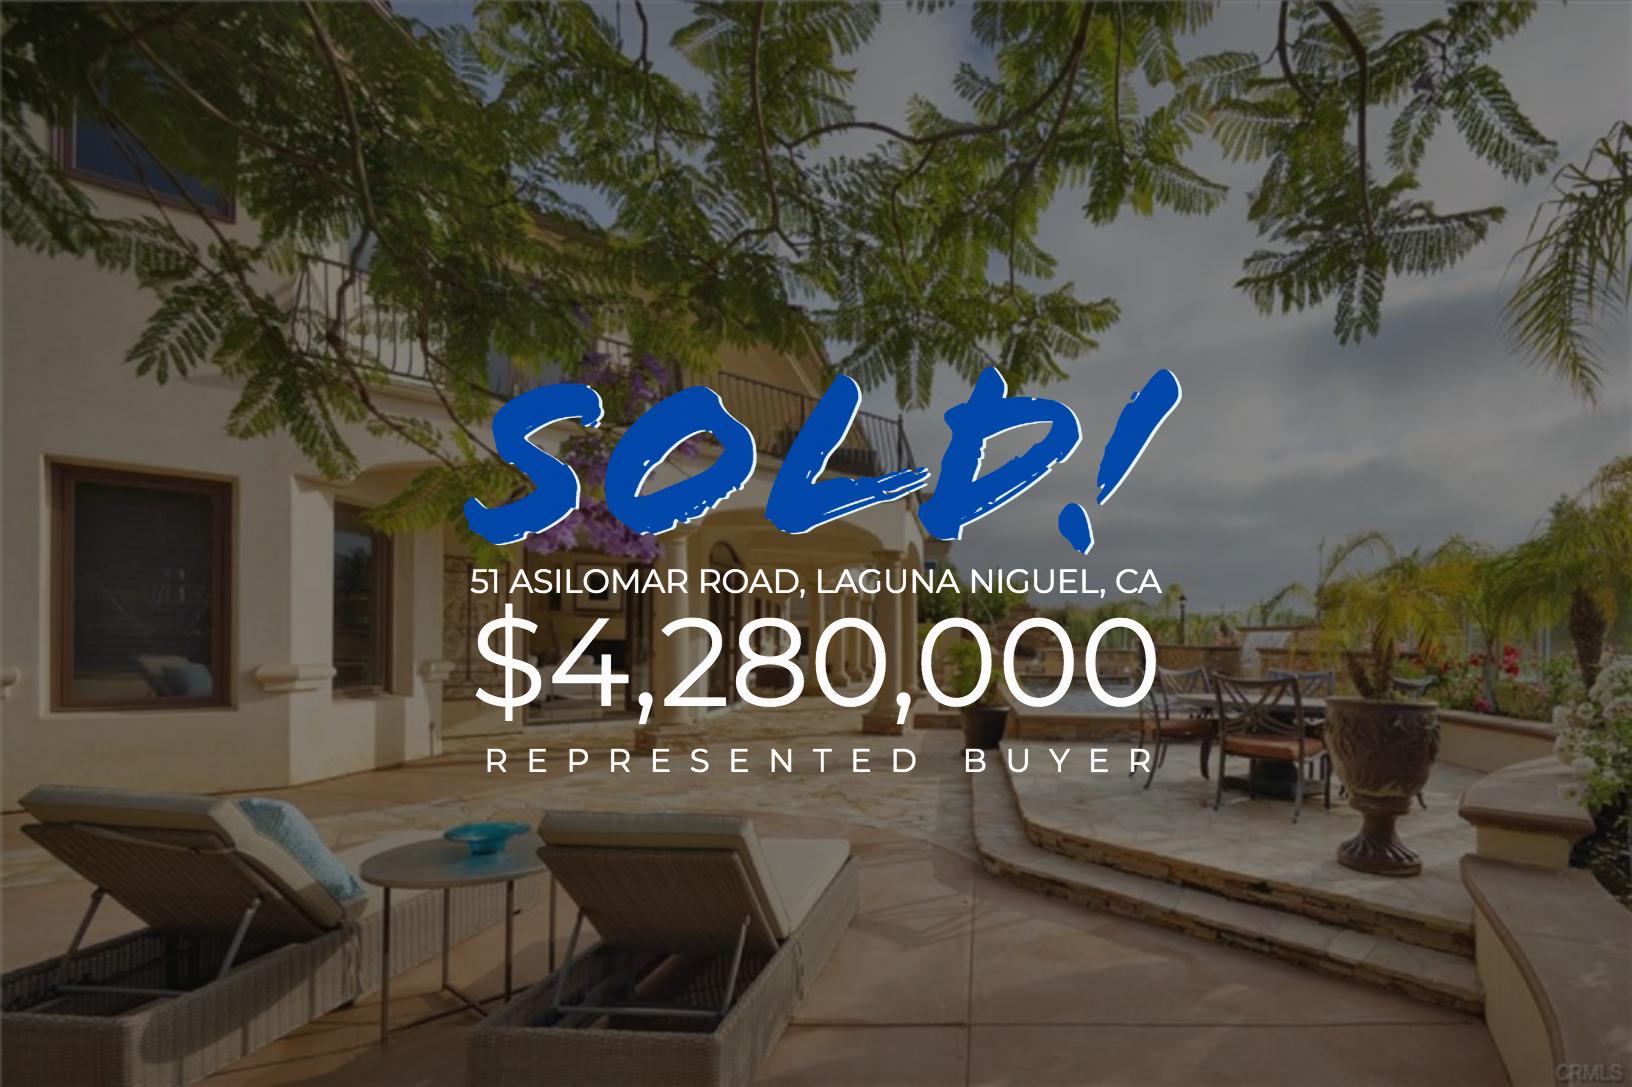 Sold With Matt Blashaw 51 Asilomar Road in Laguna Niguel, CA